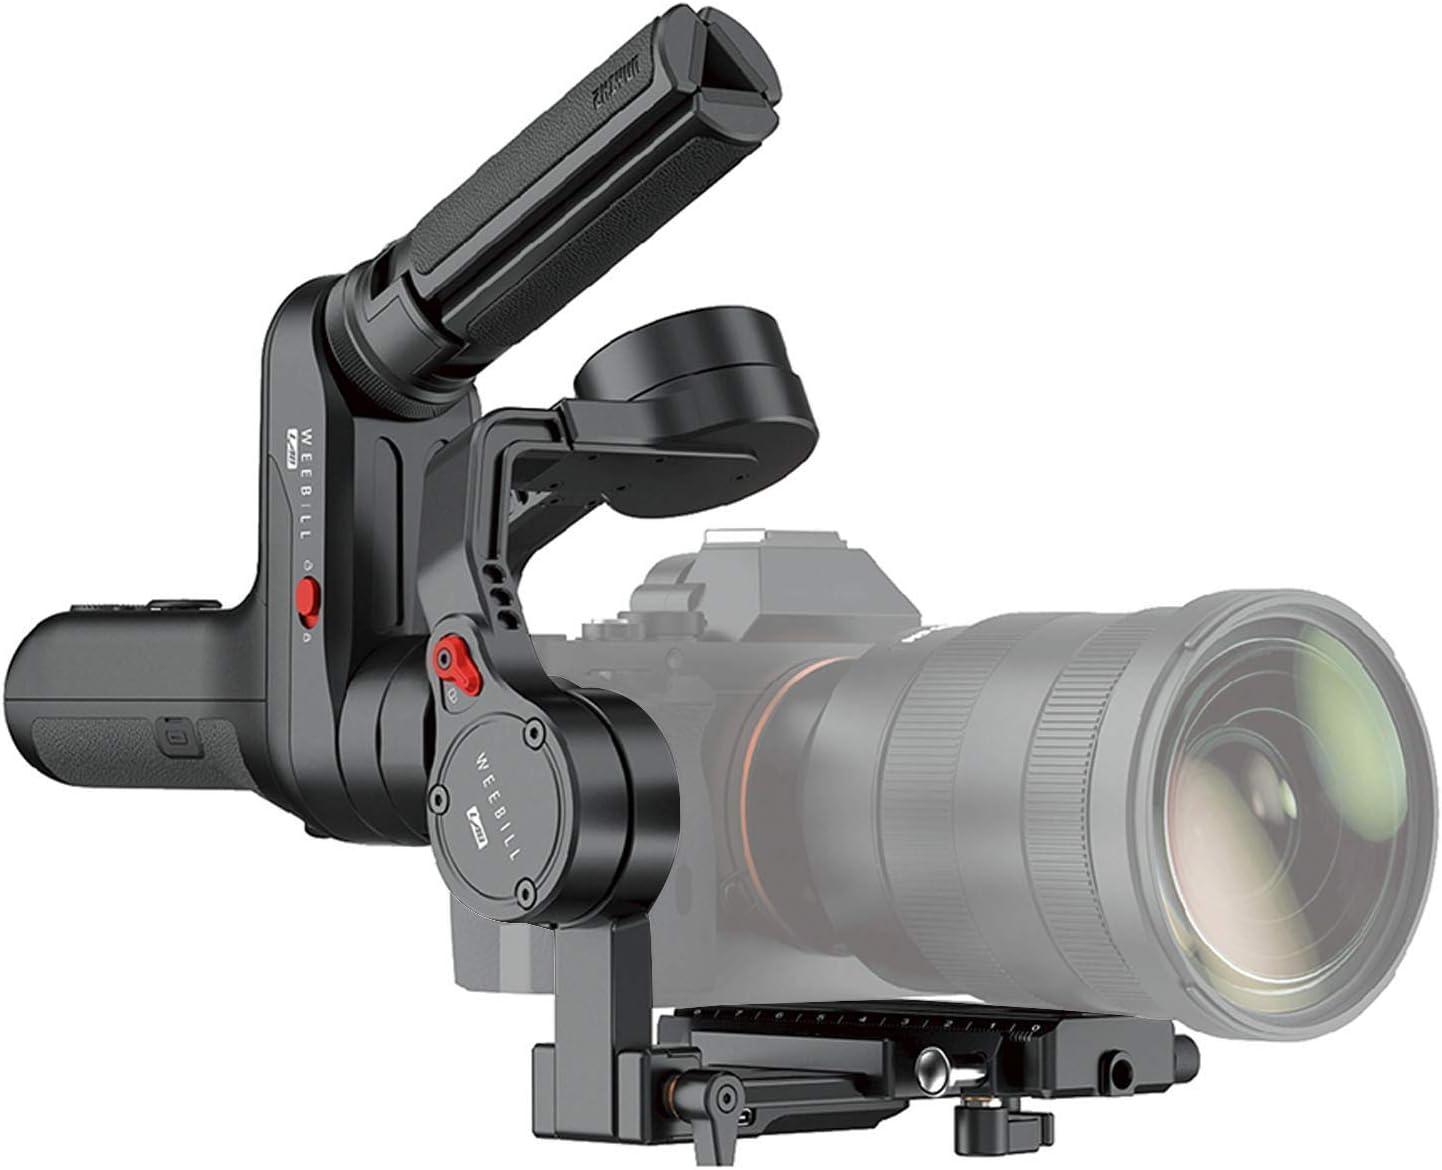 Zhiyun Weebill Lab 3 Axis Handheld Gimbal Stabilizer Kamera